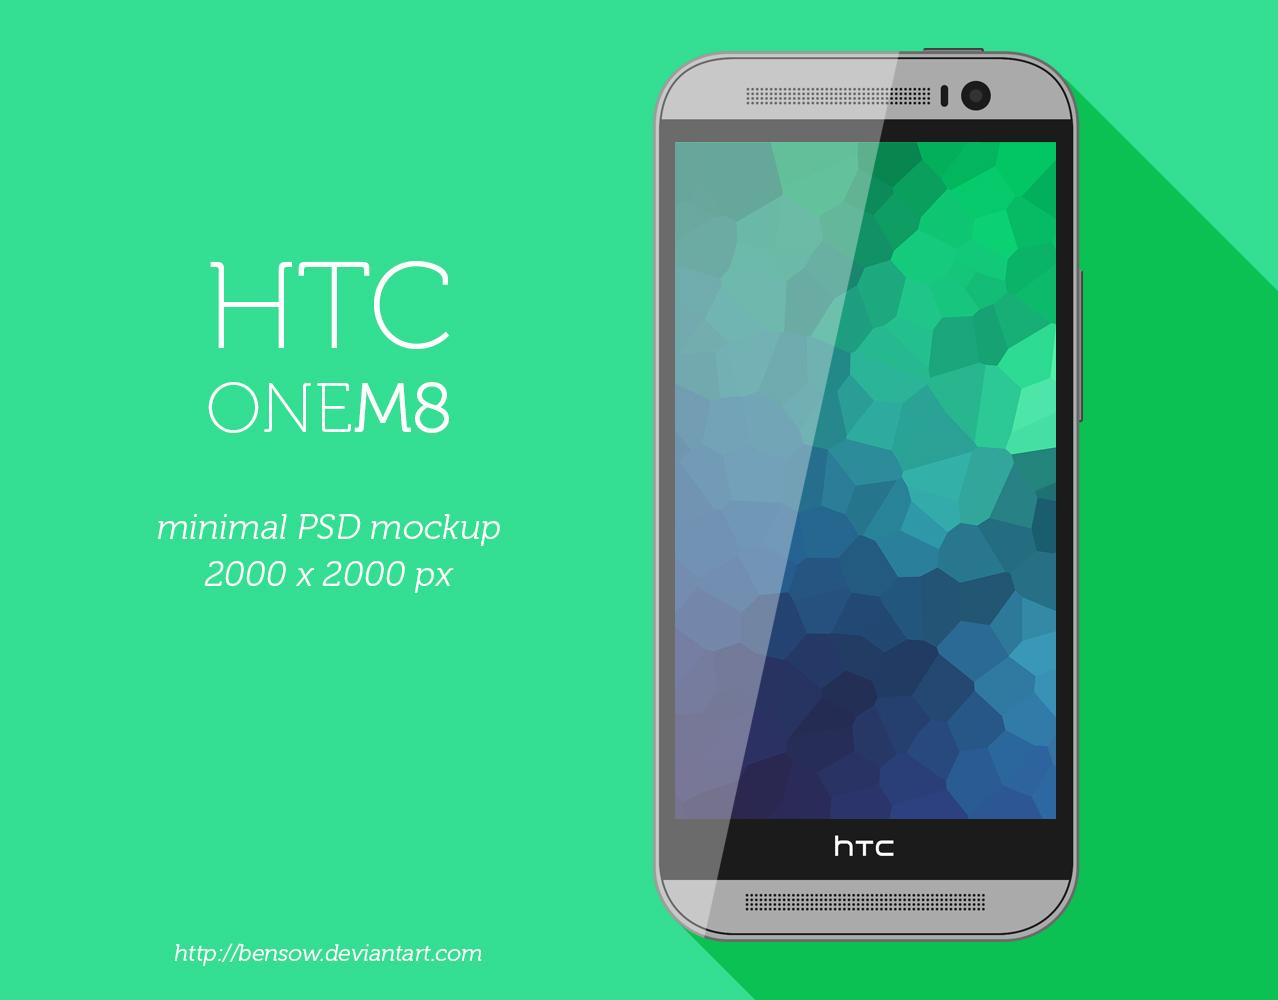 HTC One M8 Minimal PSD